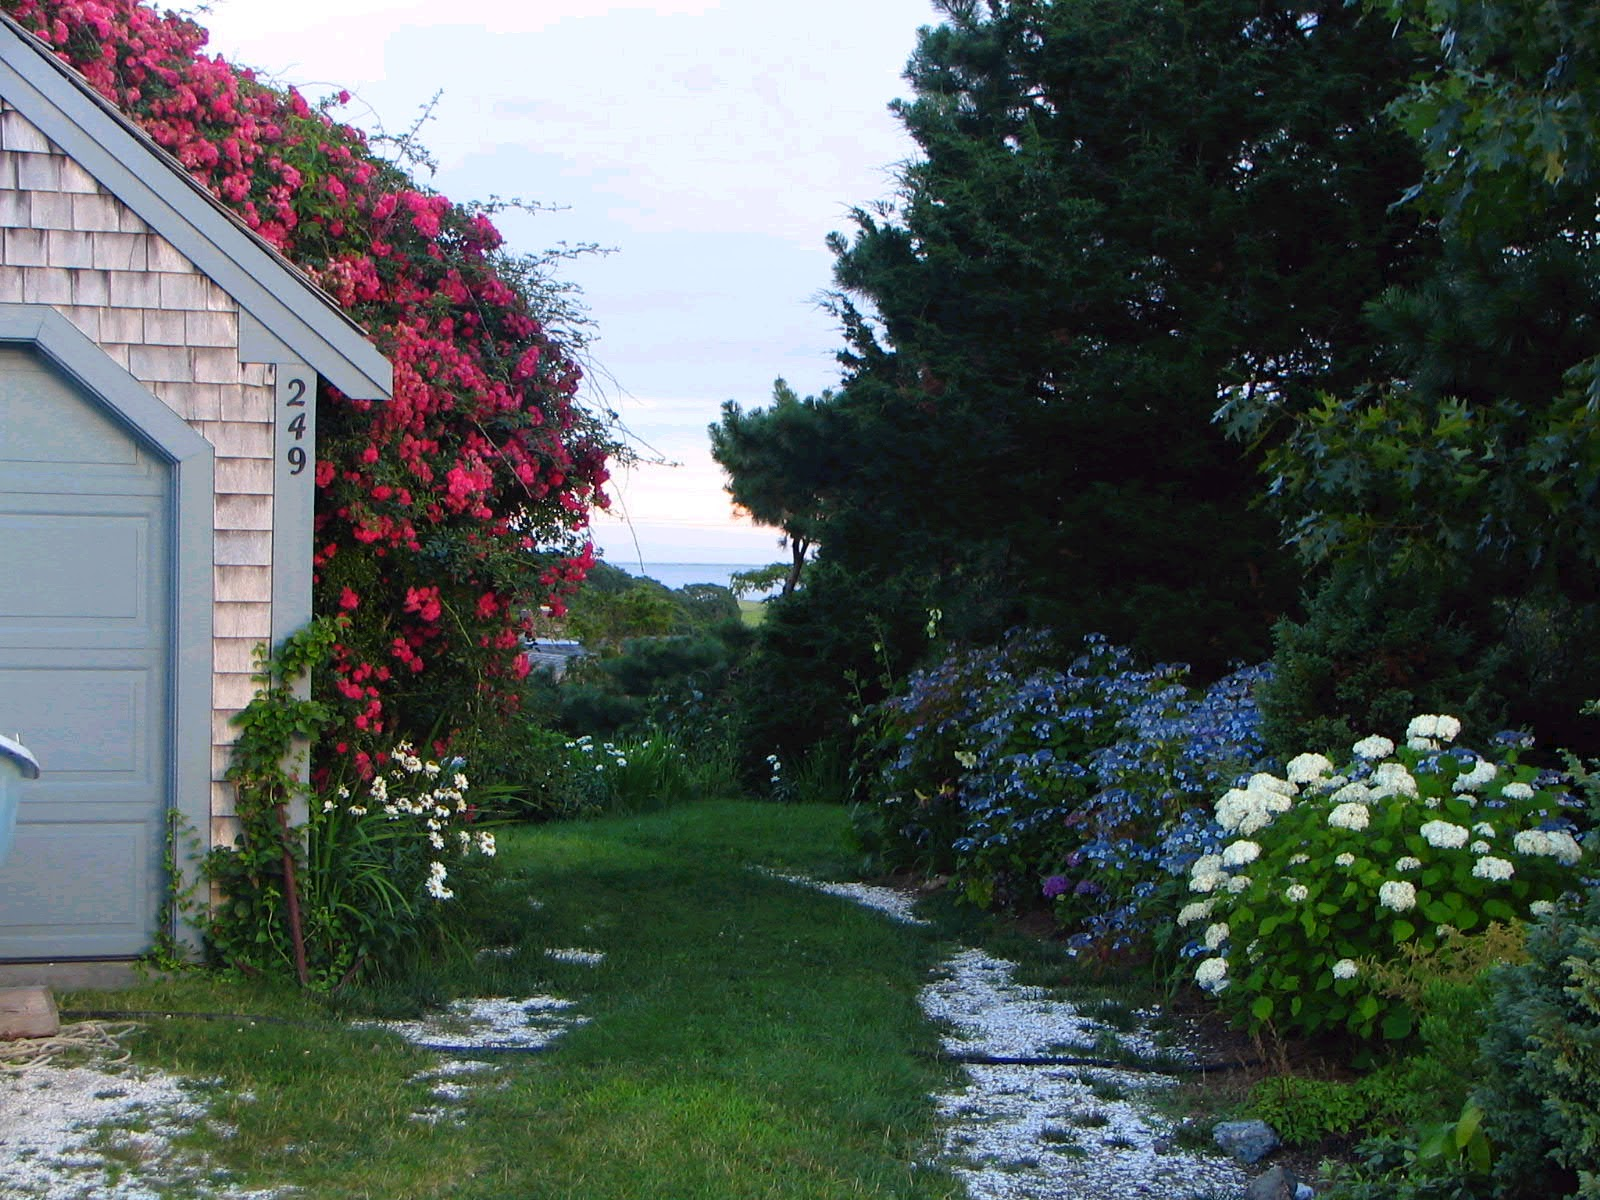 Cape Cod Rose Part - 24: Cape Cod Rambling Rose Roof Trellis. Photo Courtesy Of Ark Gardens